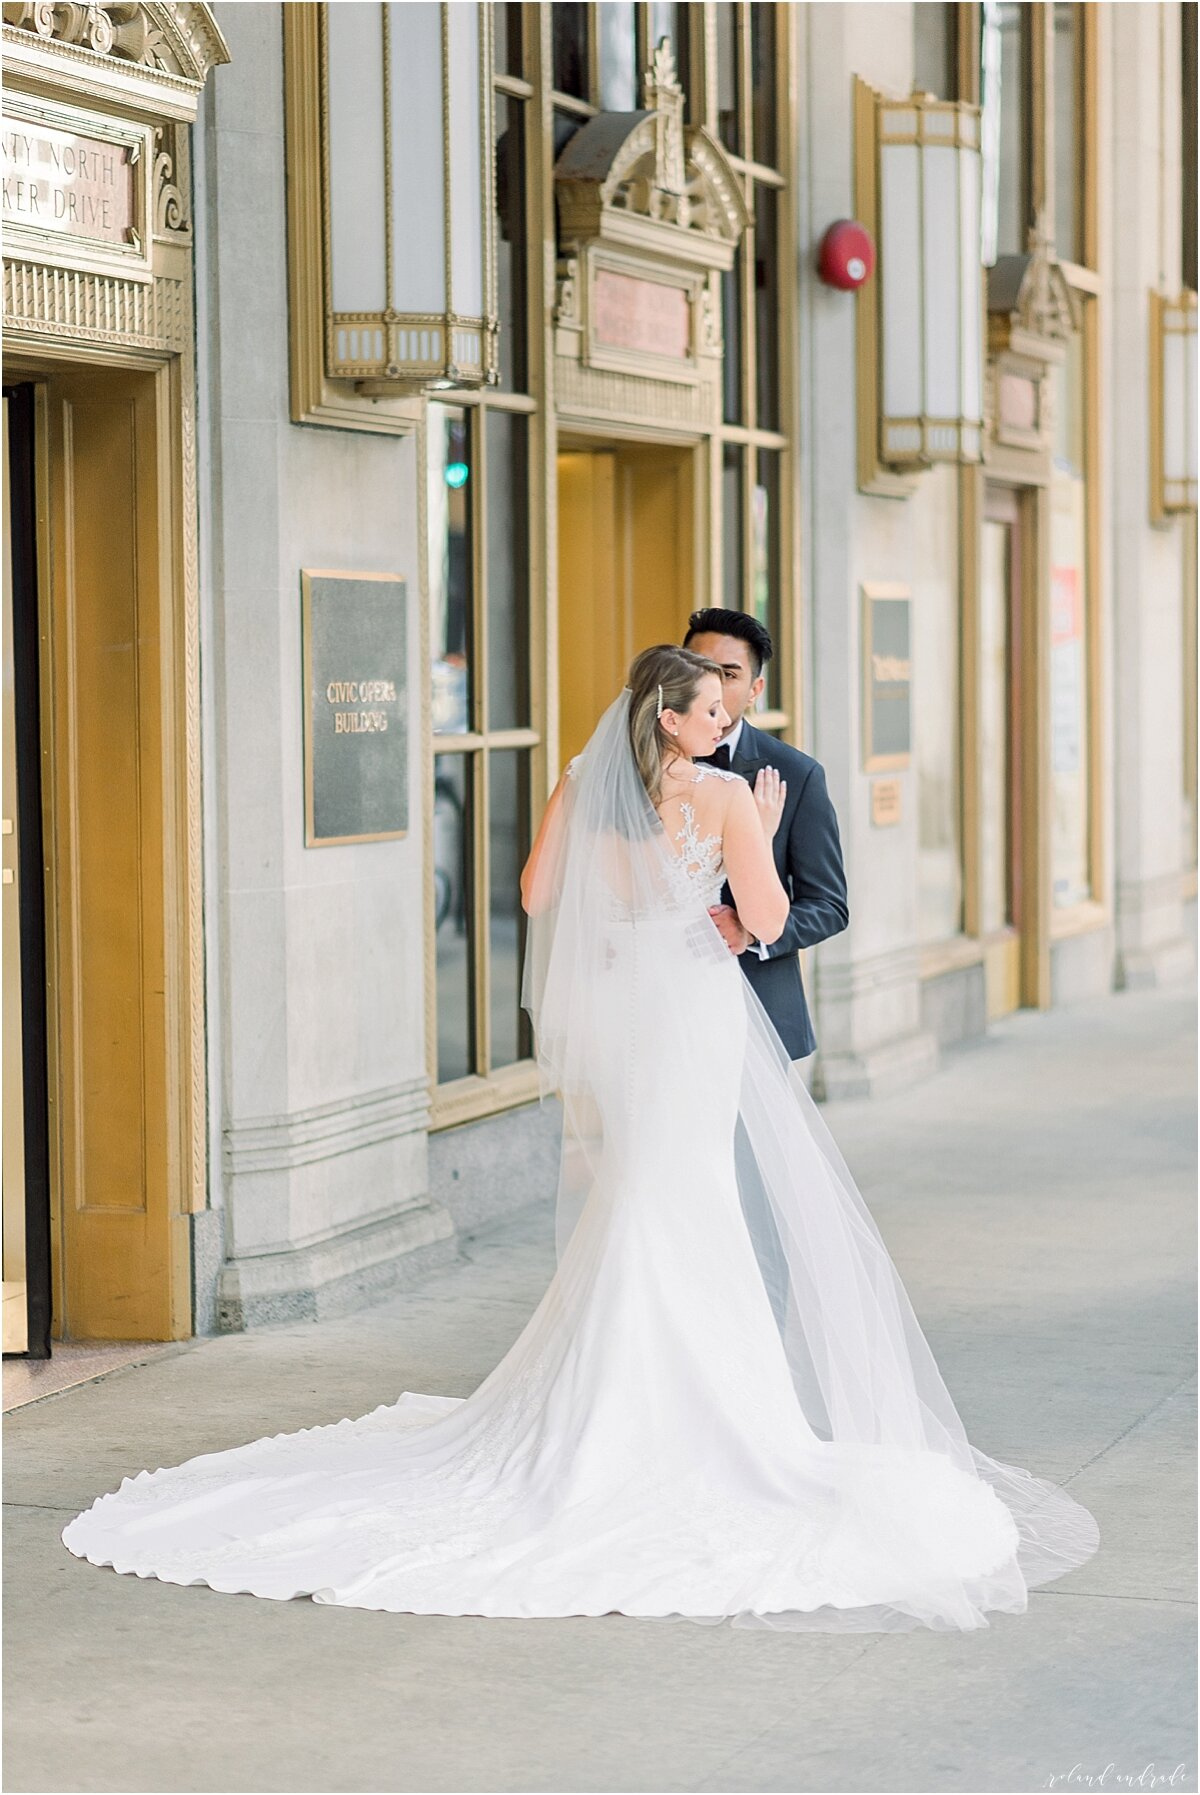 River Roast Wedding + Light and Airy Wedding Photographer Chicago + renaissance Hotel Wedding Photographer + Chicago Photography + Naperville Wedding Photographer + Chicago Engagement Photographer + Best Photographer In Chicago_0046.jpg